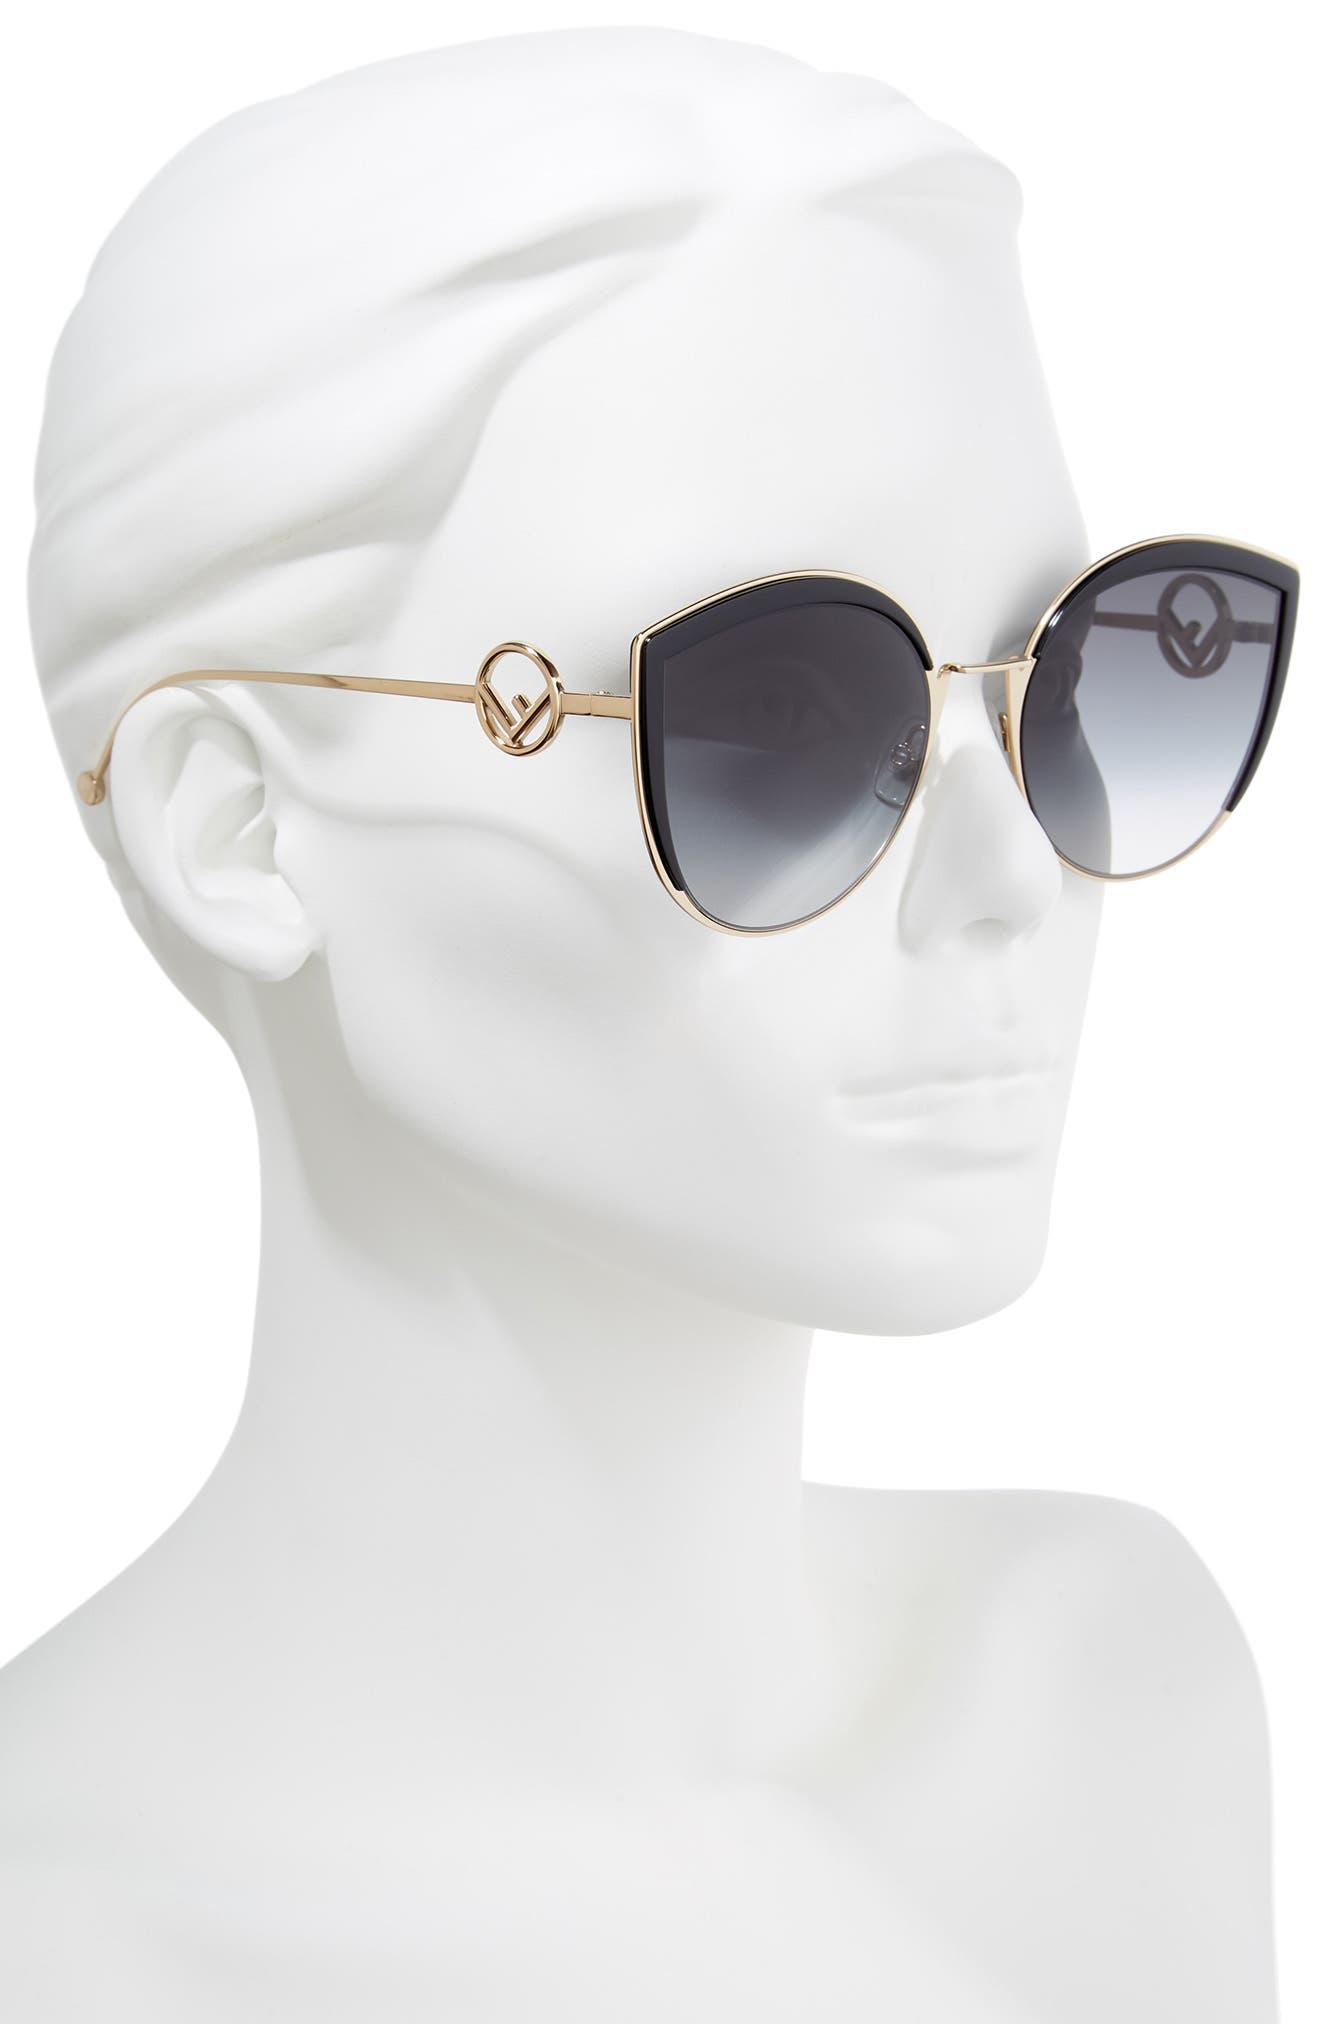 58mm Metal Butterfly Sunglasses,                             Alternate thumbnail 2, color,                             BLACK